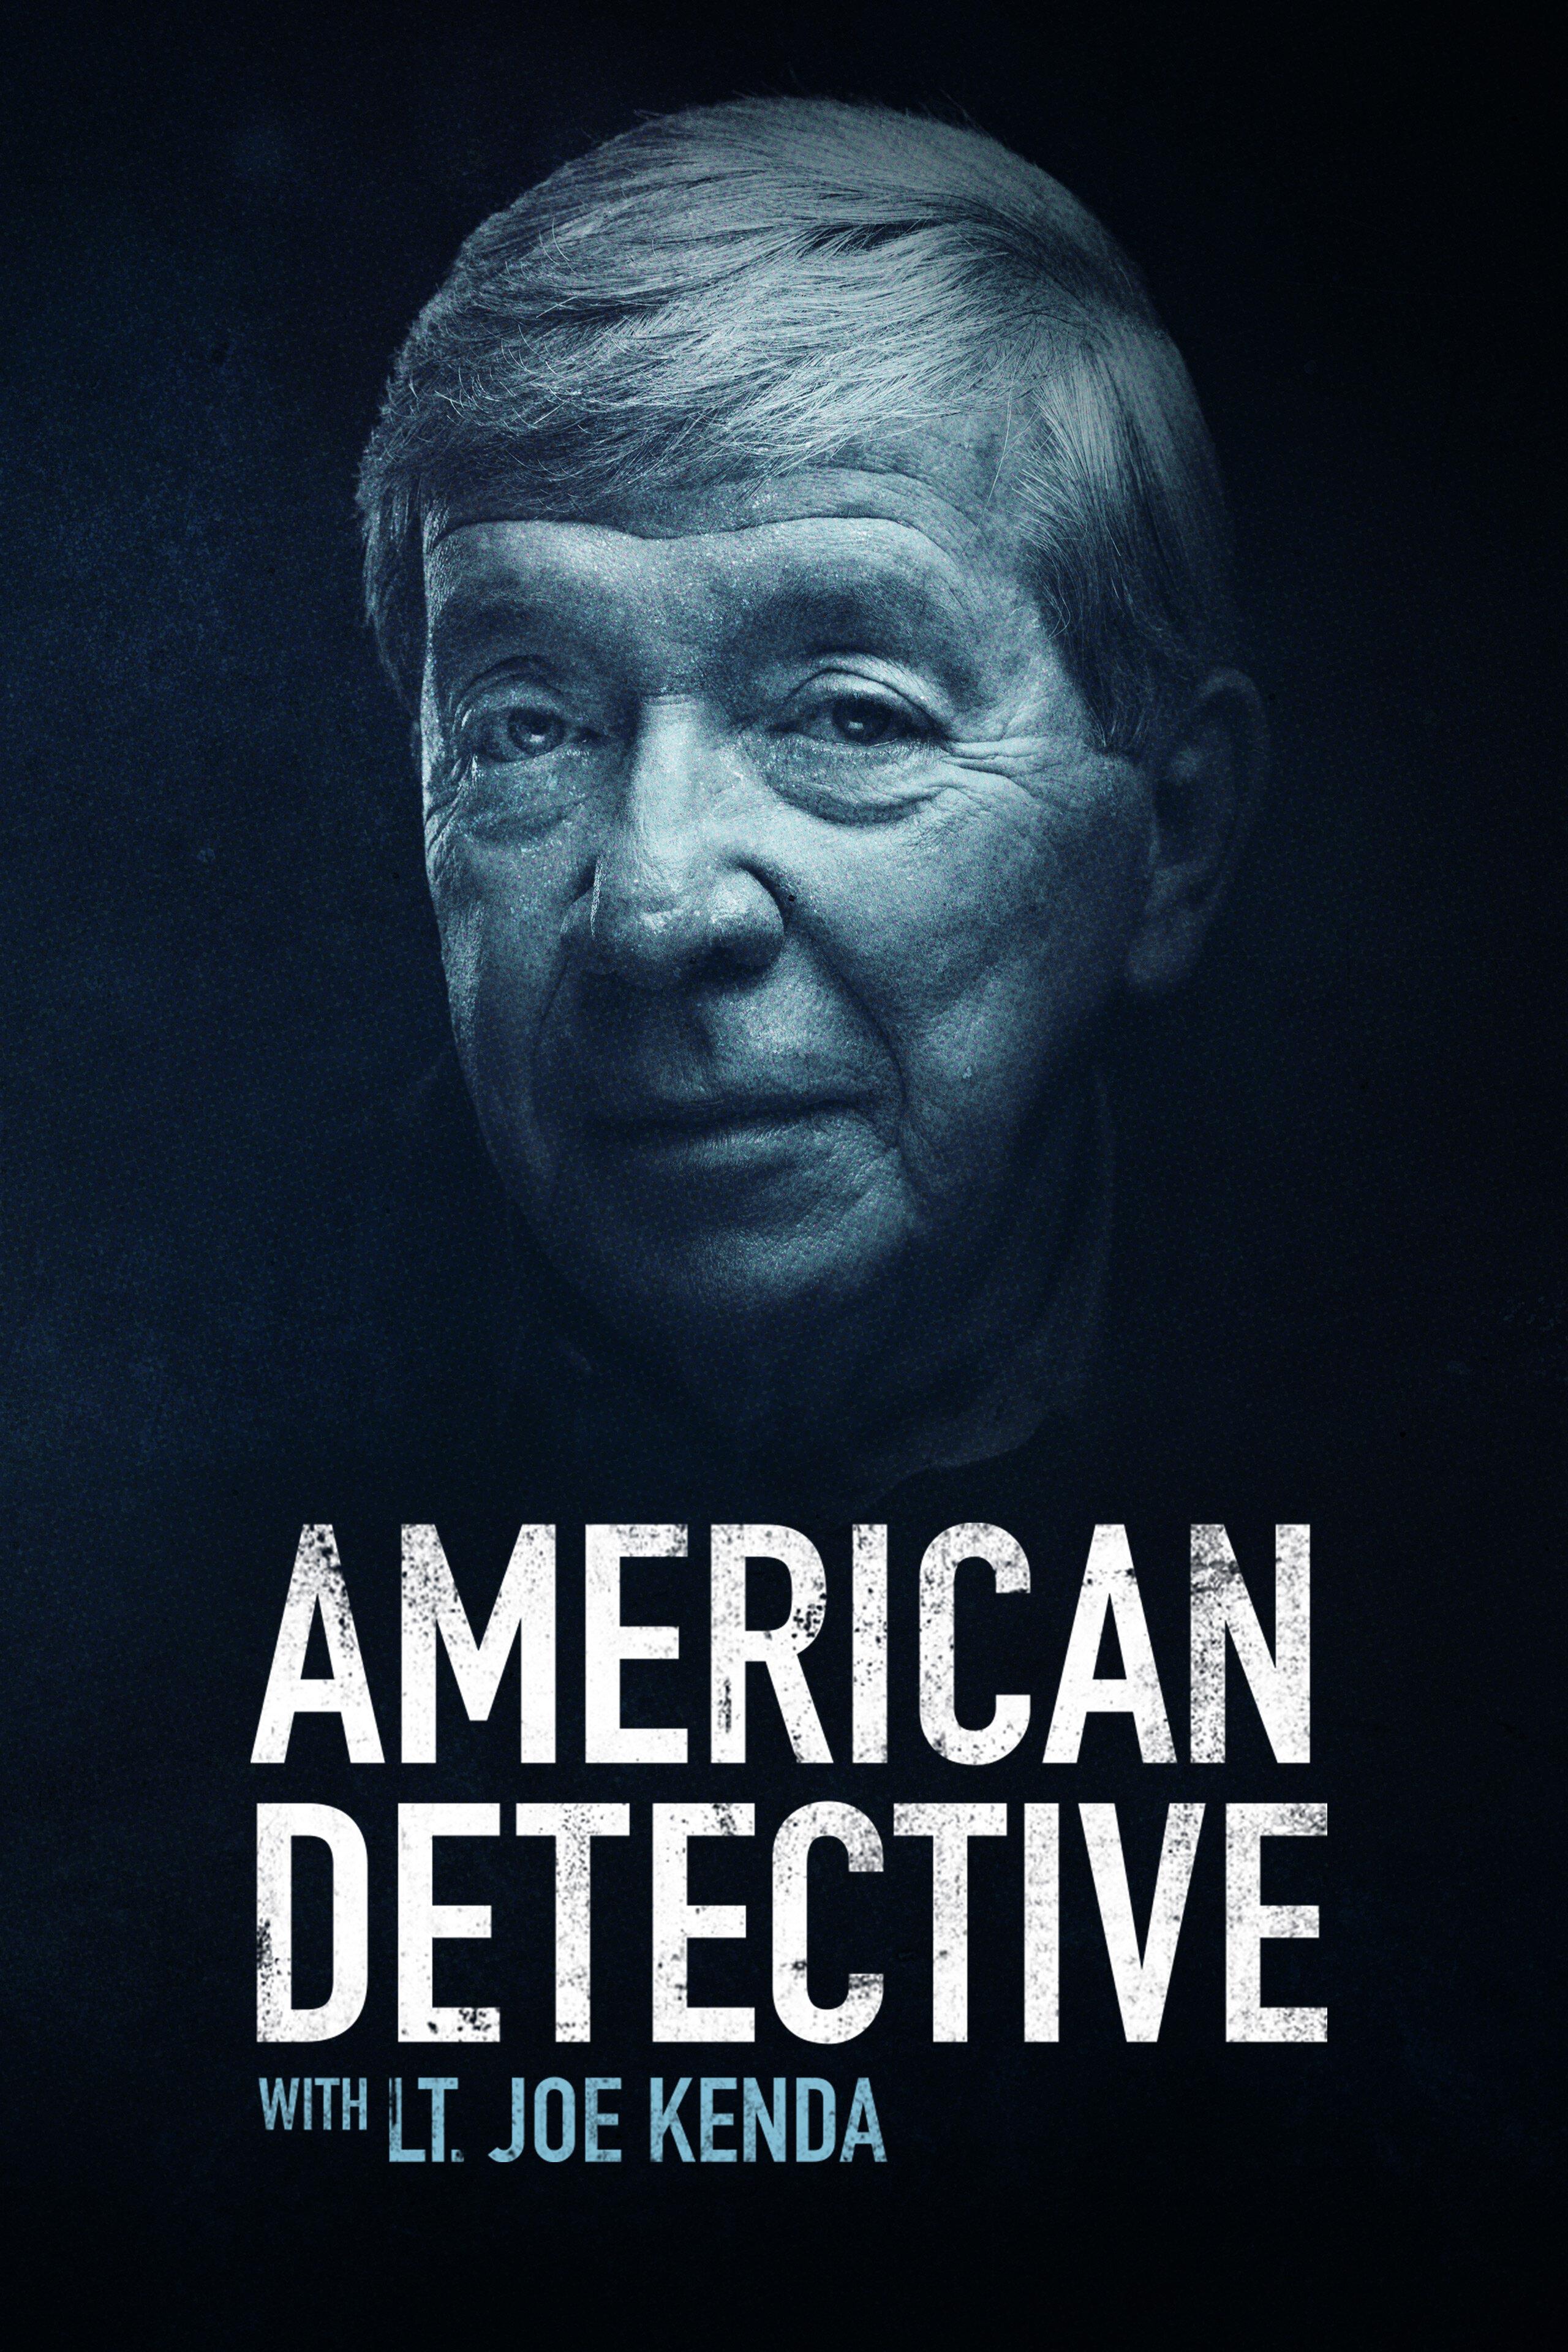 American Detective with Lt. Joe Kenda ne zaman